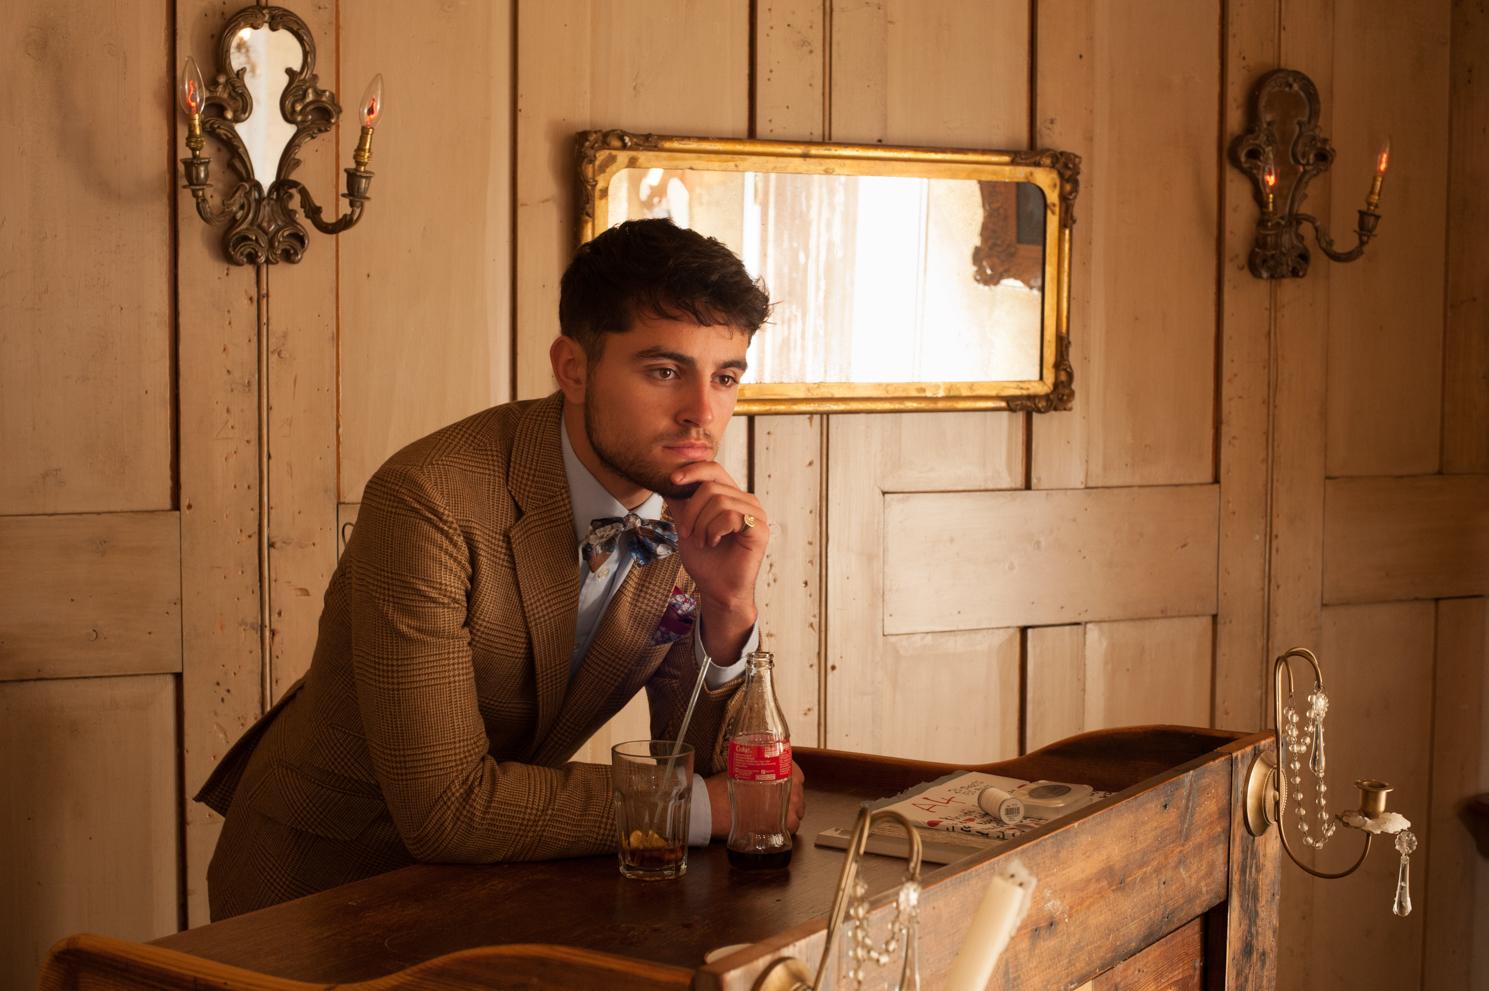 The thinking man. Men's fashion photography by Farnham, Surrey based portrait photographer James Muller